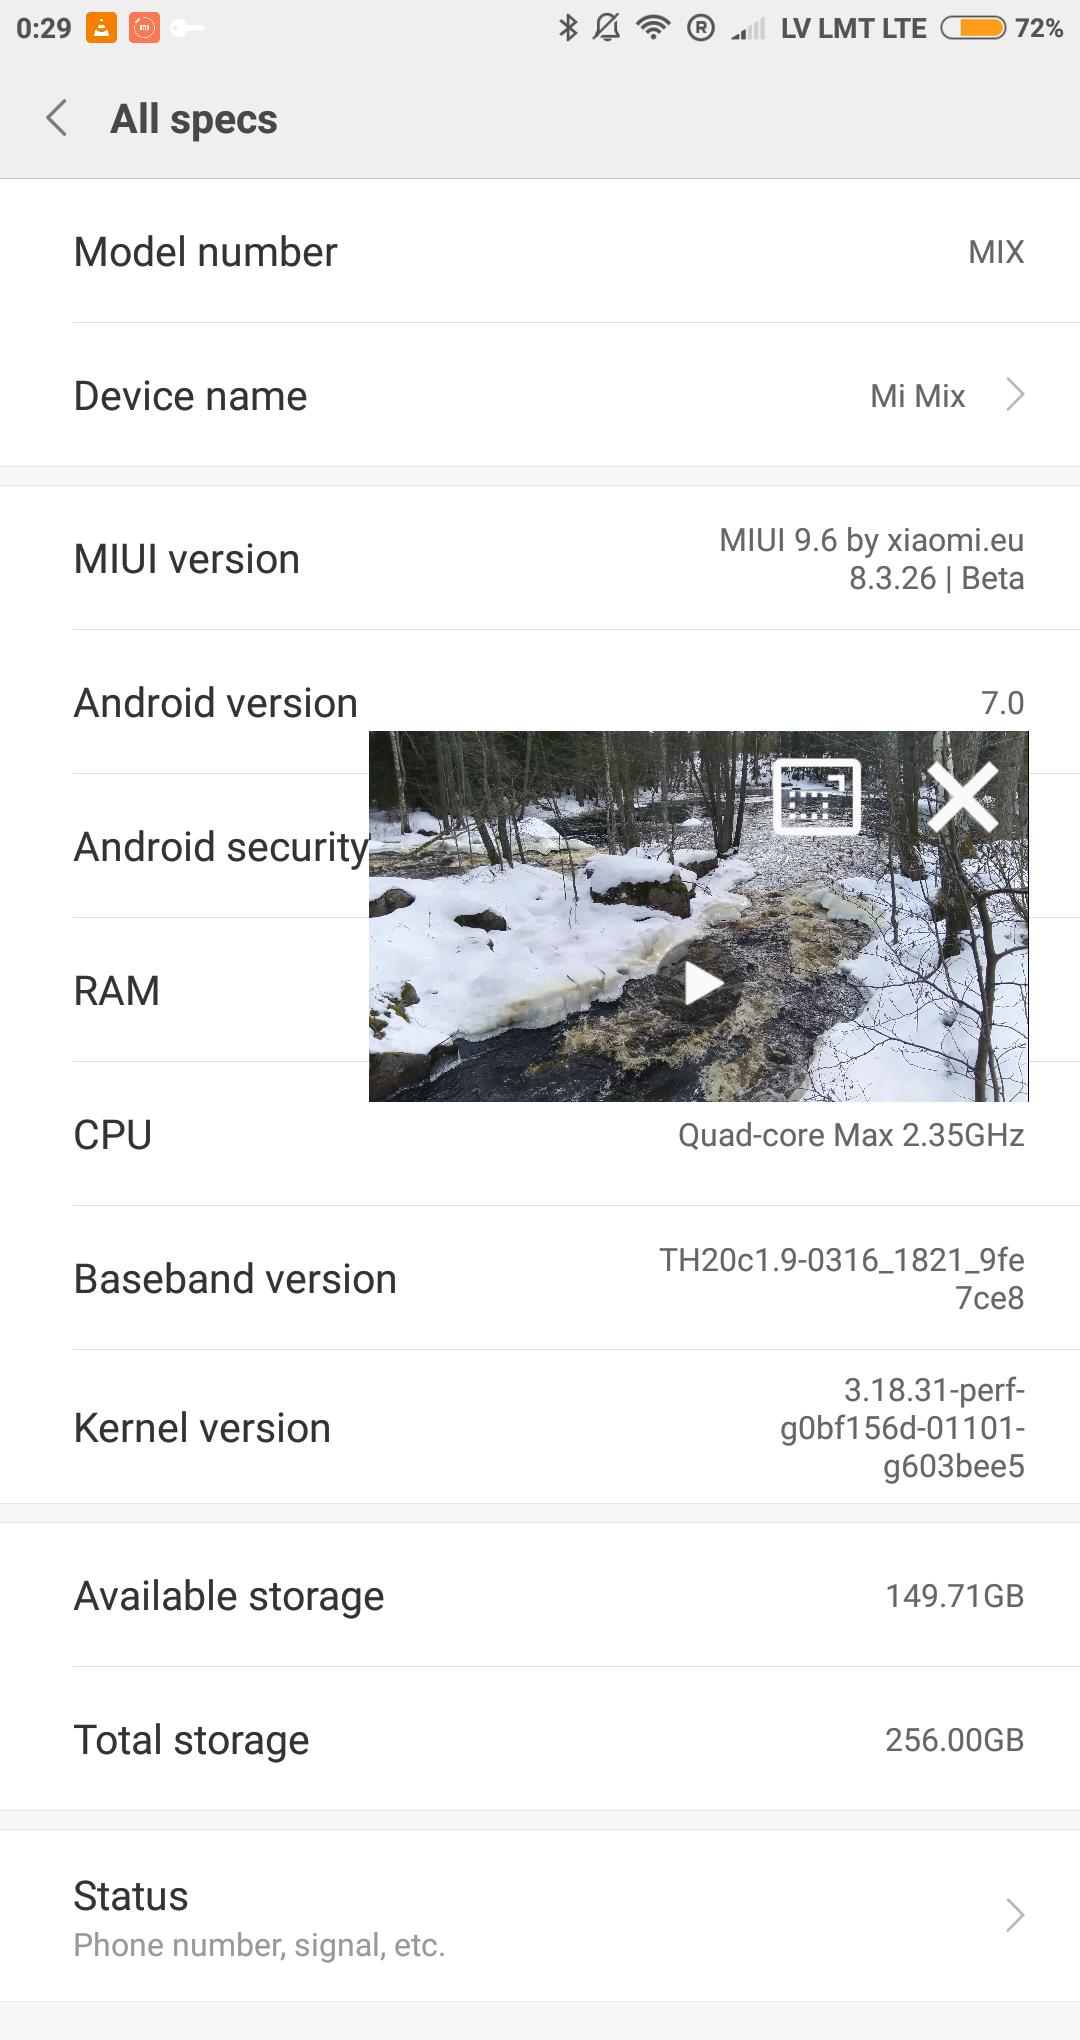 Screenshot_2018-05-08-00-29-32-388_com.android.settings.png